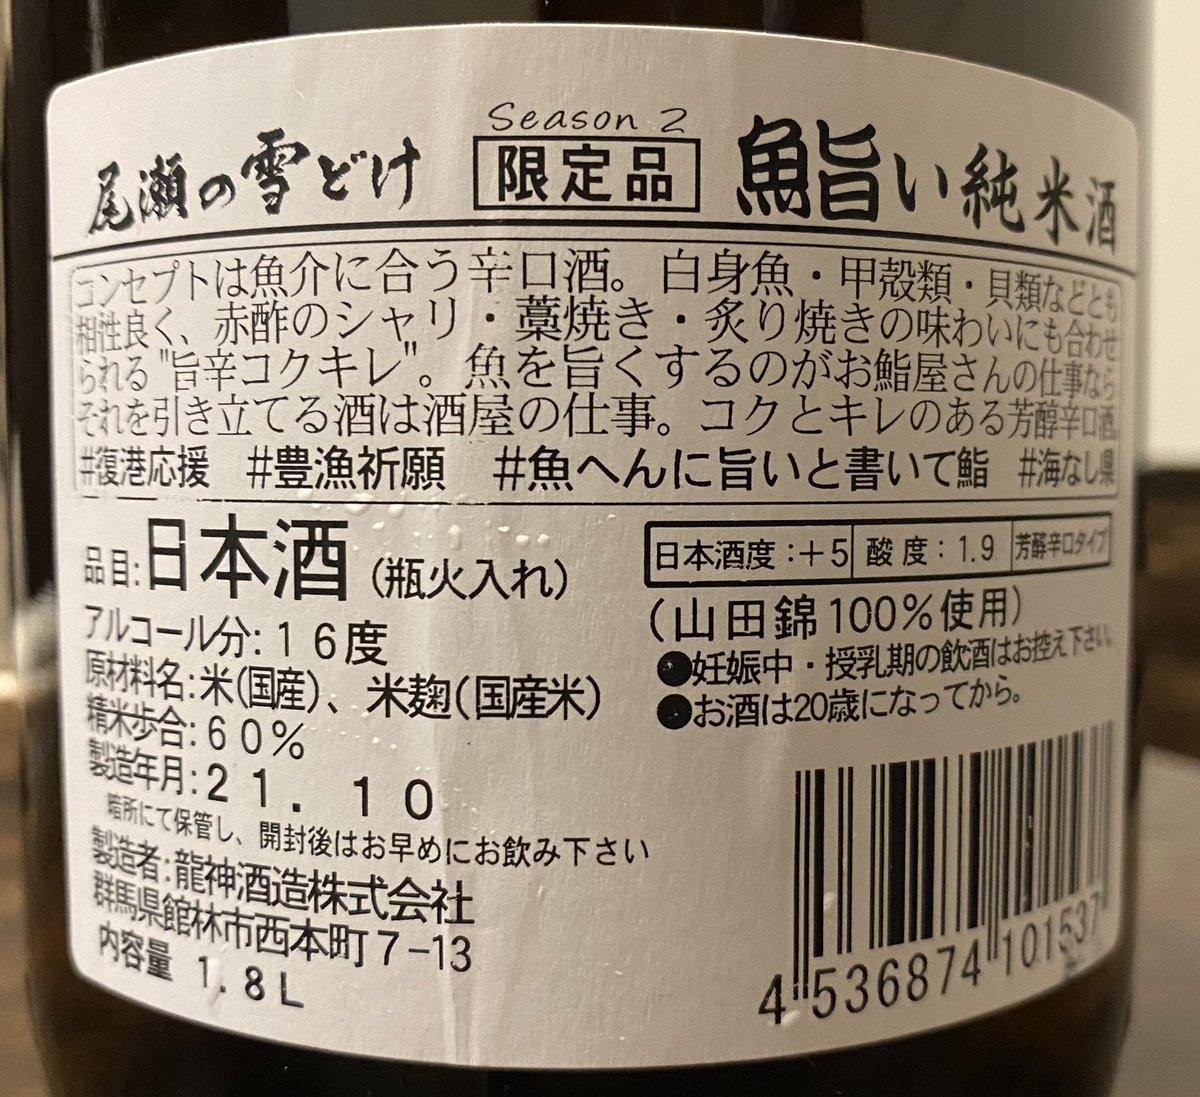 test ツイッターメディア - これはびっくり 本当にキレがあってスッキリ このお酒の概念が  尾瀬の雪どけ 魚旨い純米酒  #日本酒 #sake #地酒 #尾瀬の雪どけ #群馬 https://t.co/4wiRLfT0Pu